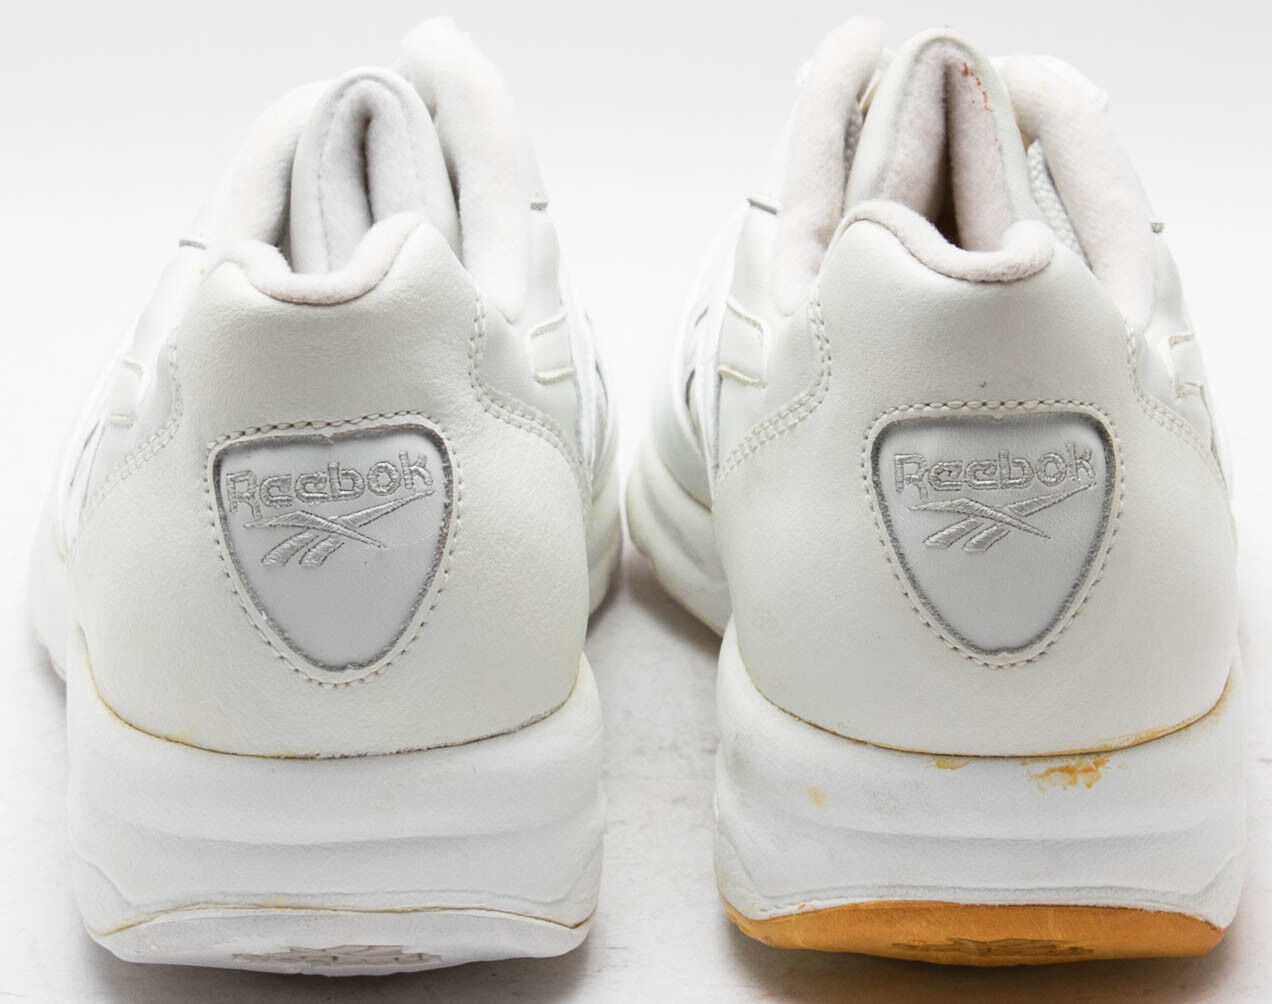 Reebok Men's Vintage 1994 Comfort Walking DMX 10.5 Shoes 11-25991 White sz. 10.5 DMX 187193